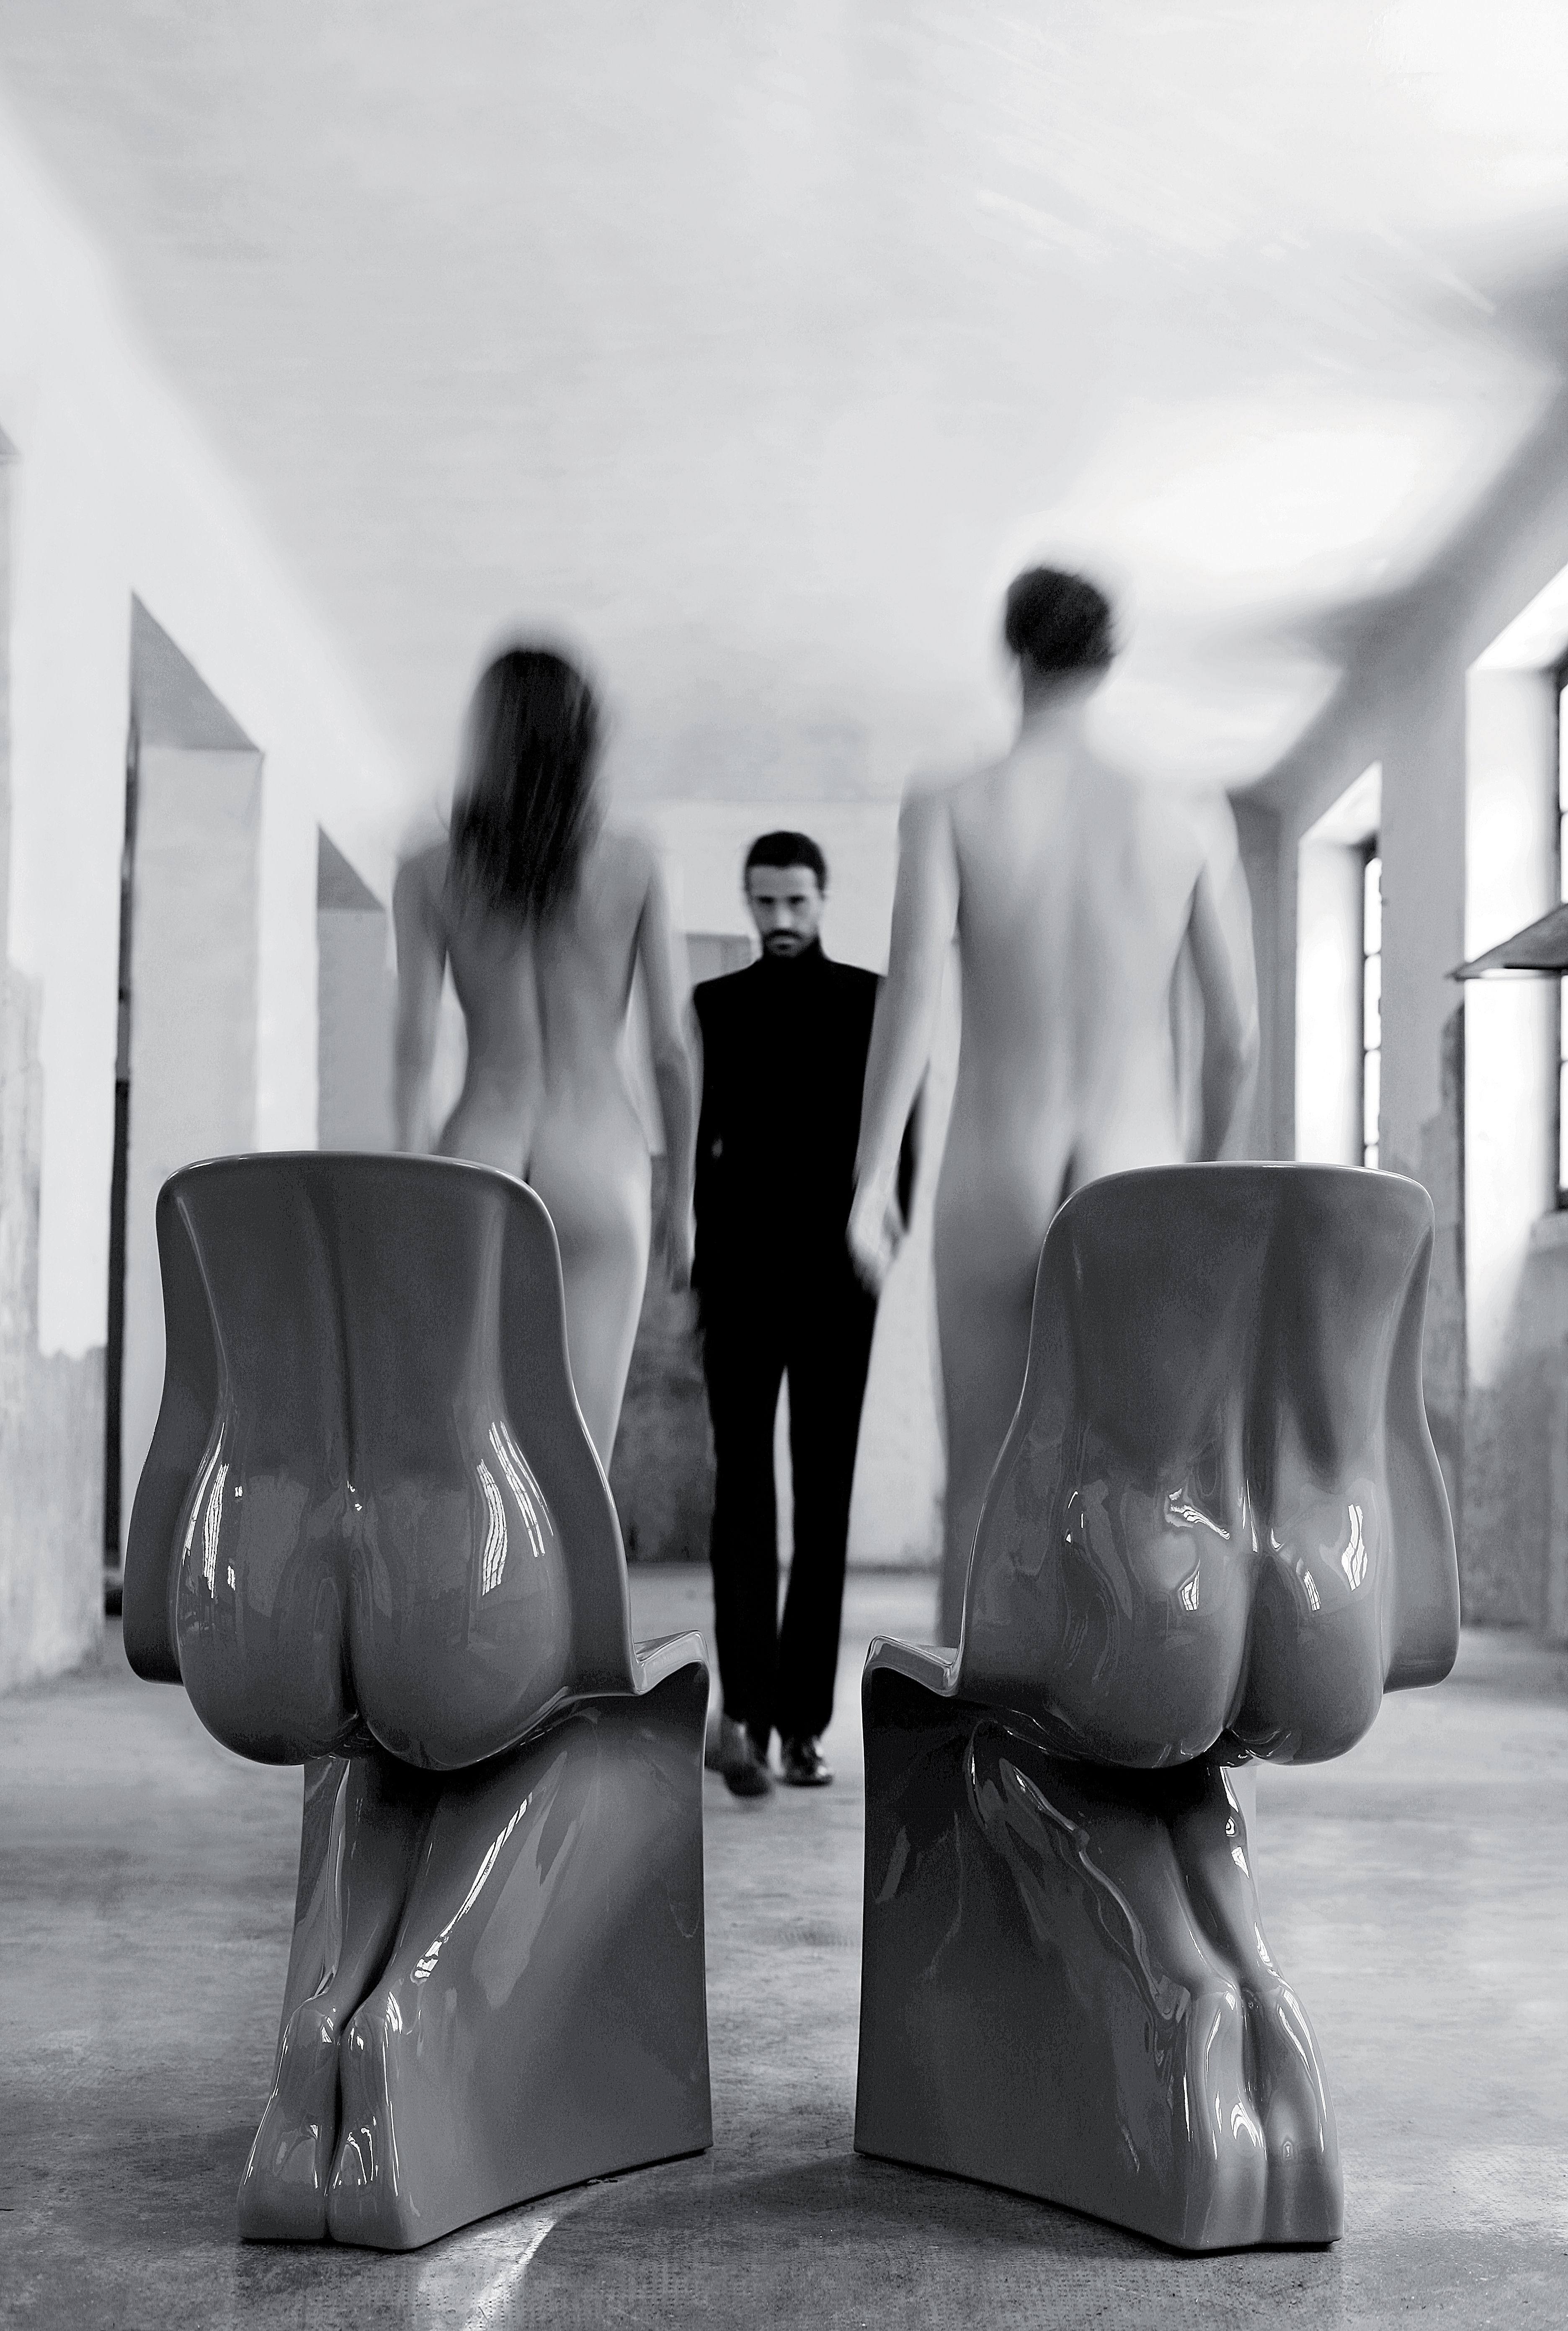 Her chair plastic white by casamania for Fabio novembre